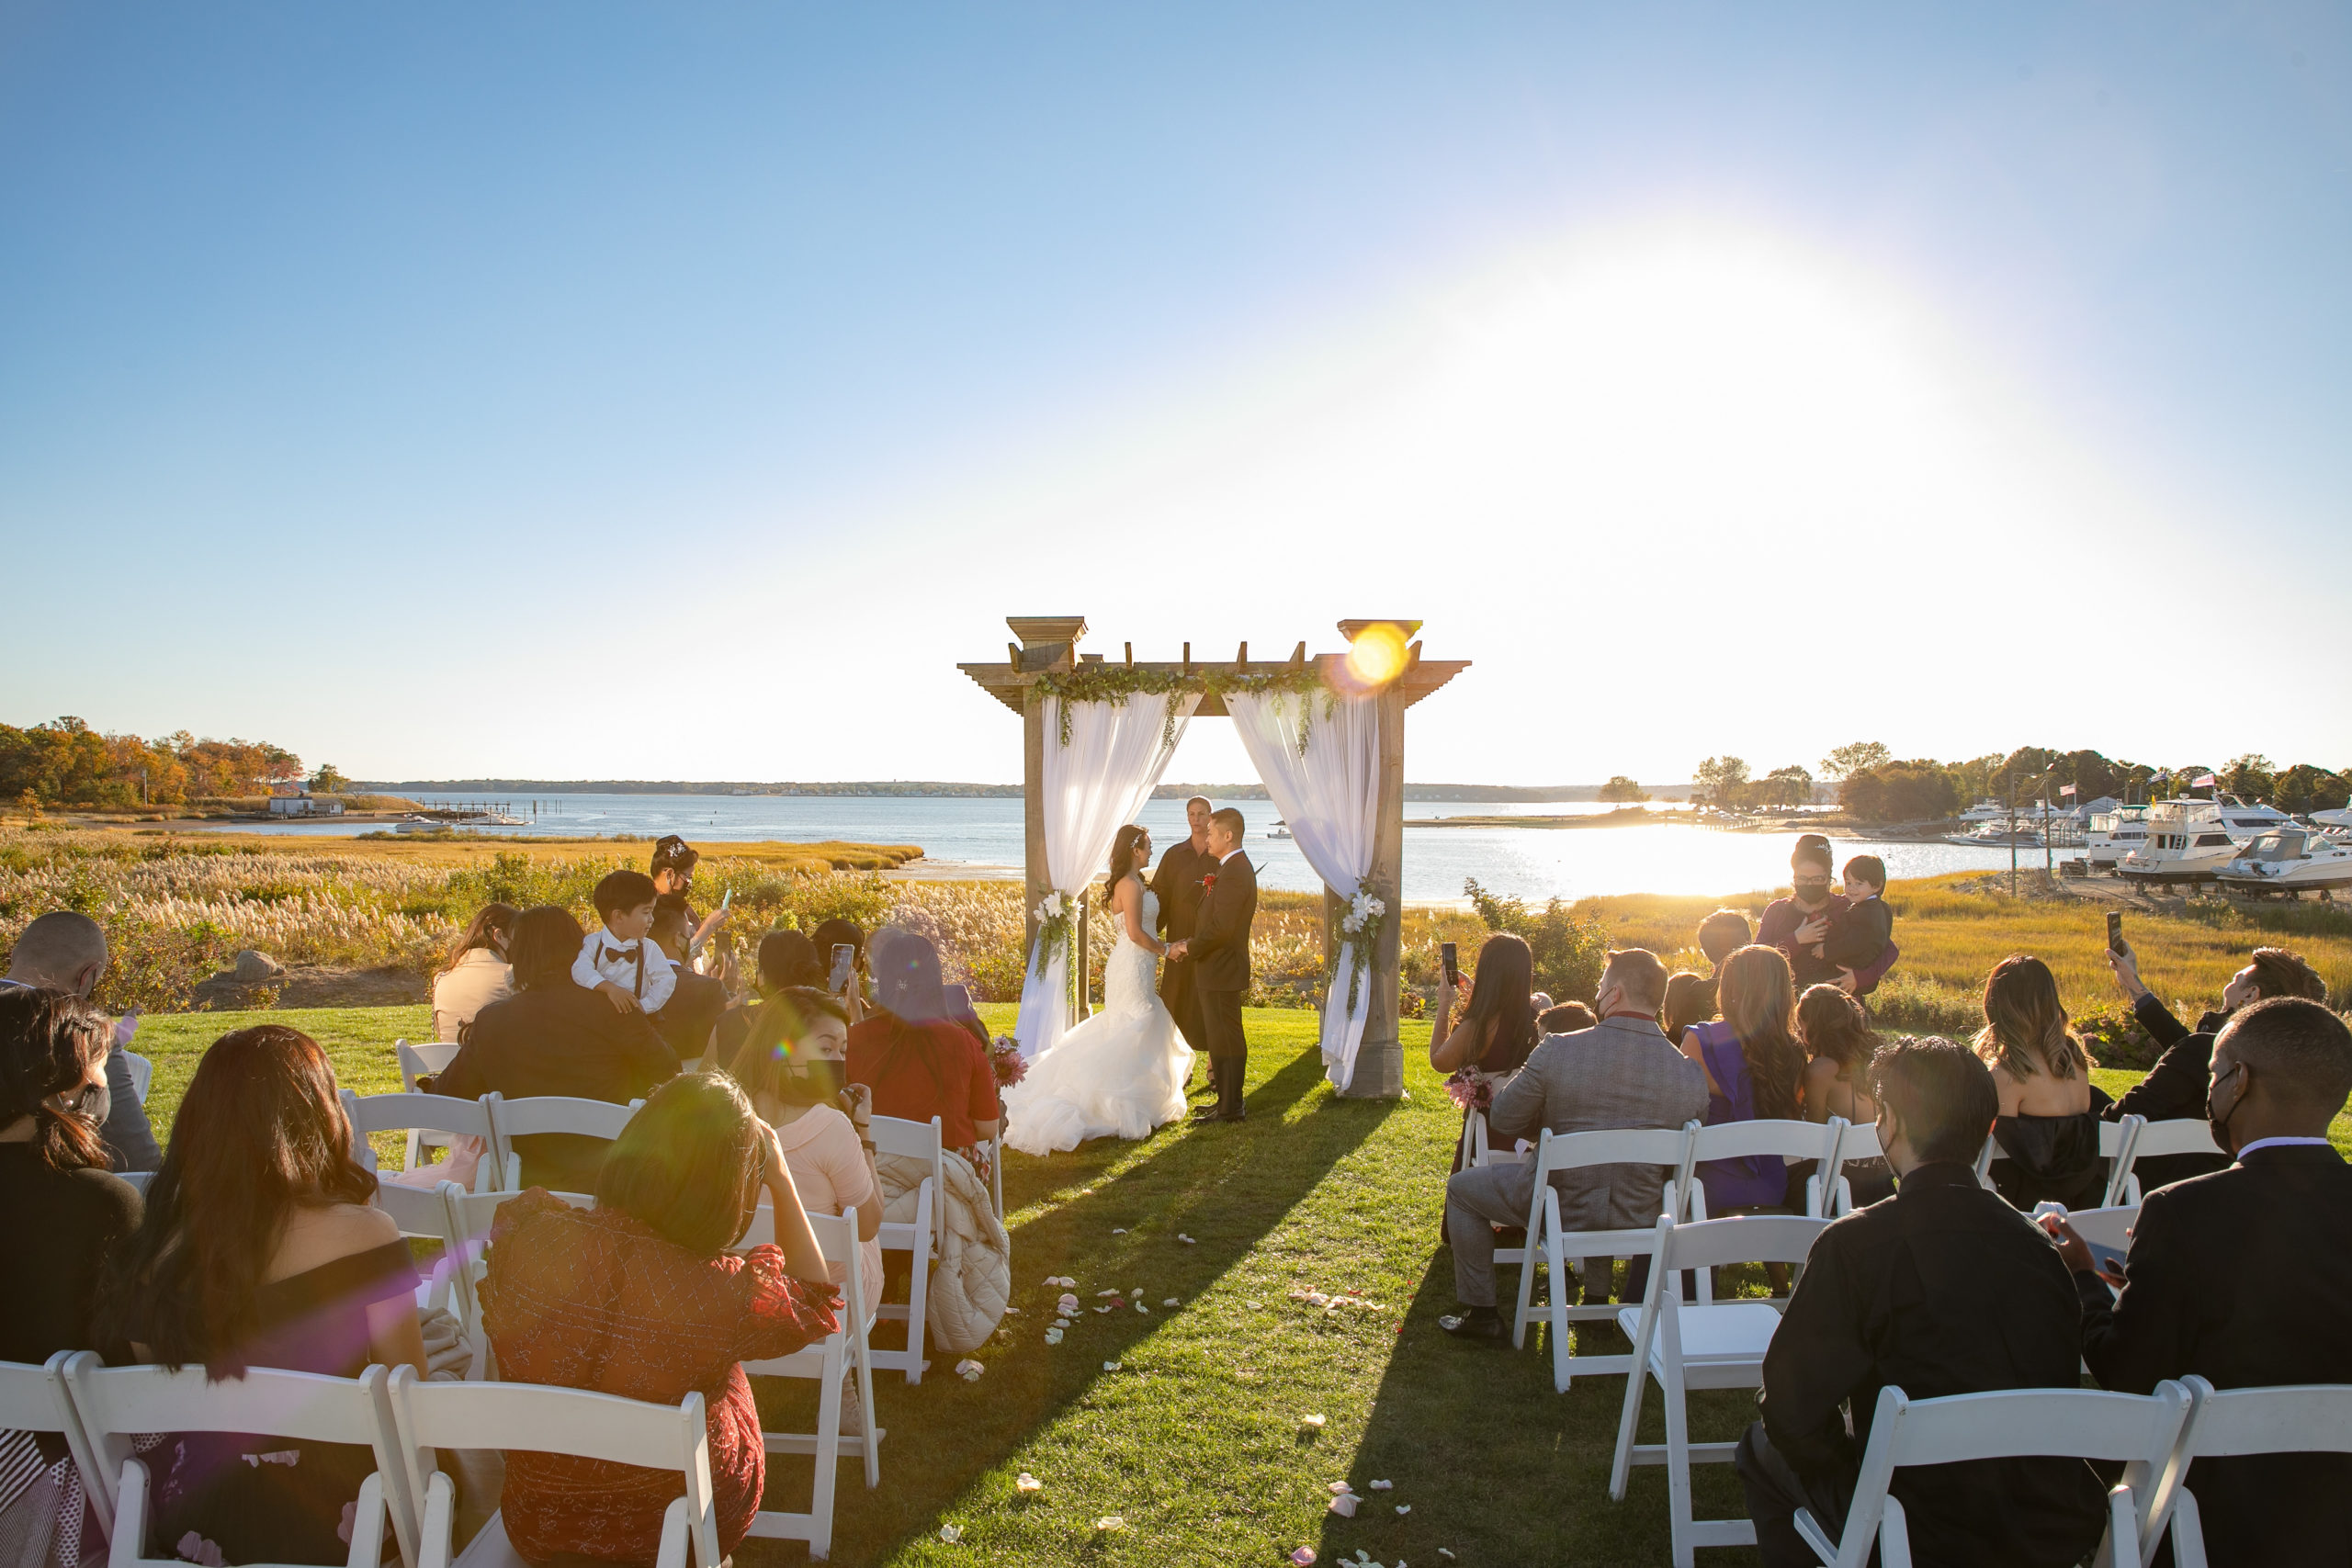 Harbor lights, warwick, rhode island, RI, Tracy Jenkins Photography, RI wedding photographer, Rhode Island wedding photographer, micro-wedding, wedding ceremony, seaside wedding, ocean wedding